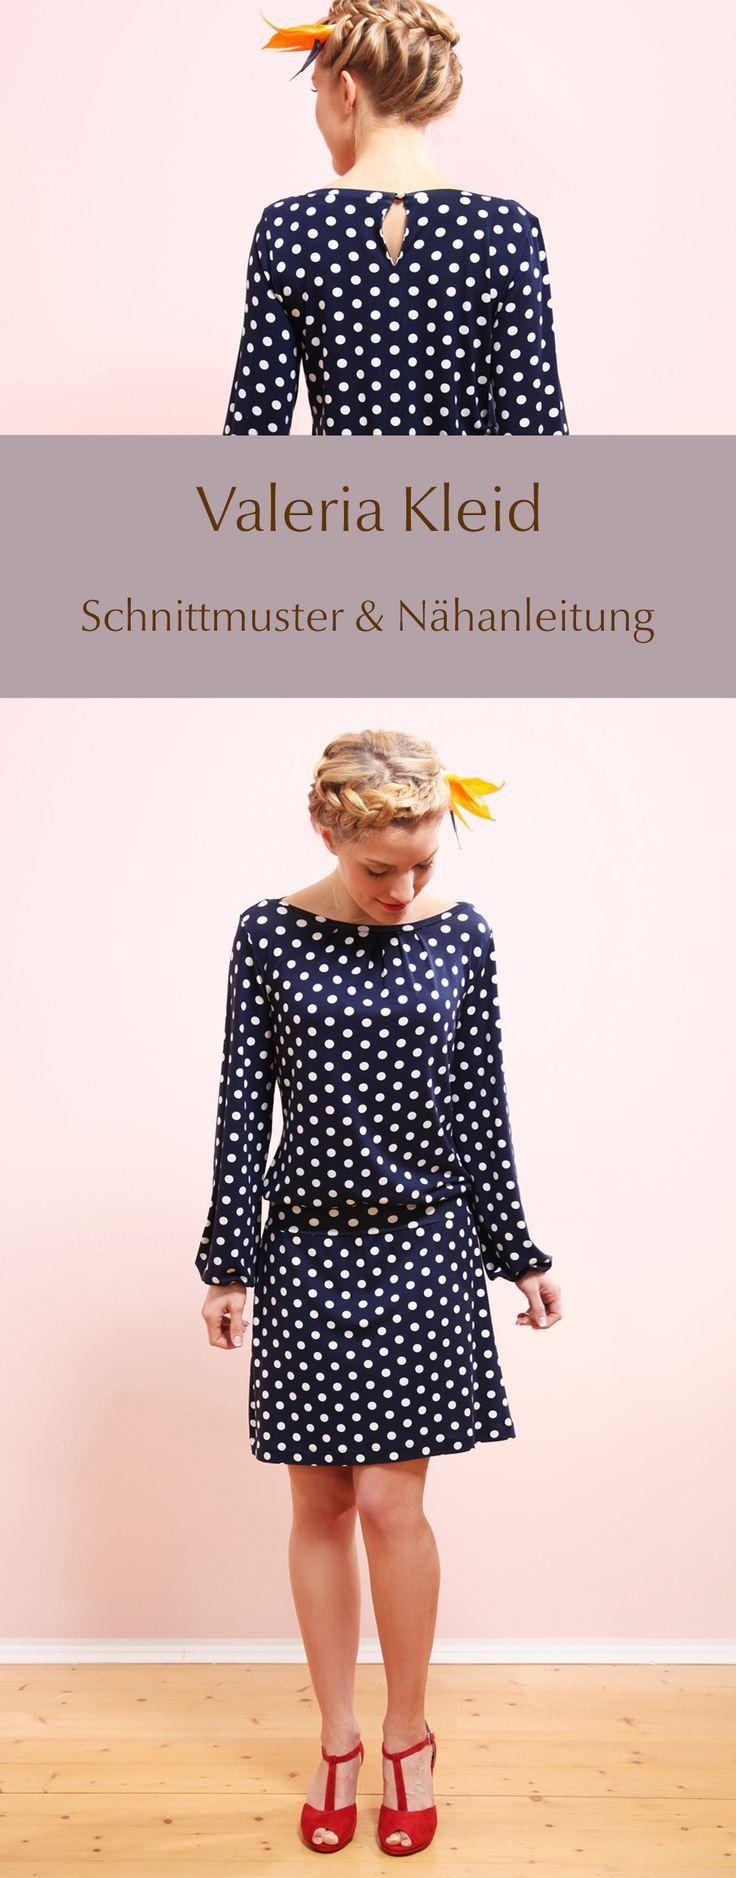 DIY Schnittmuster & Nähanleitung - Valeria Kleid selber nähen